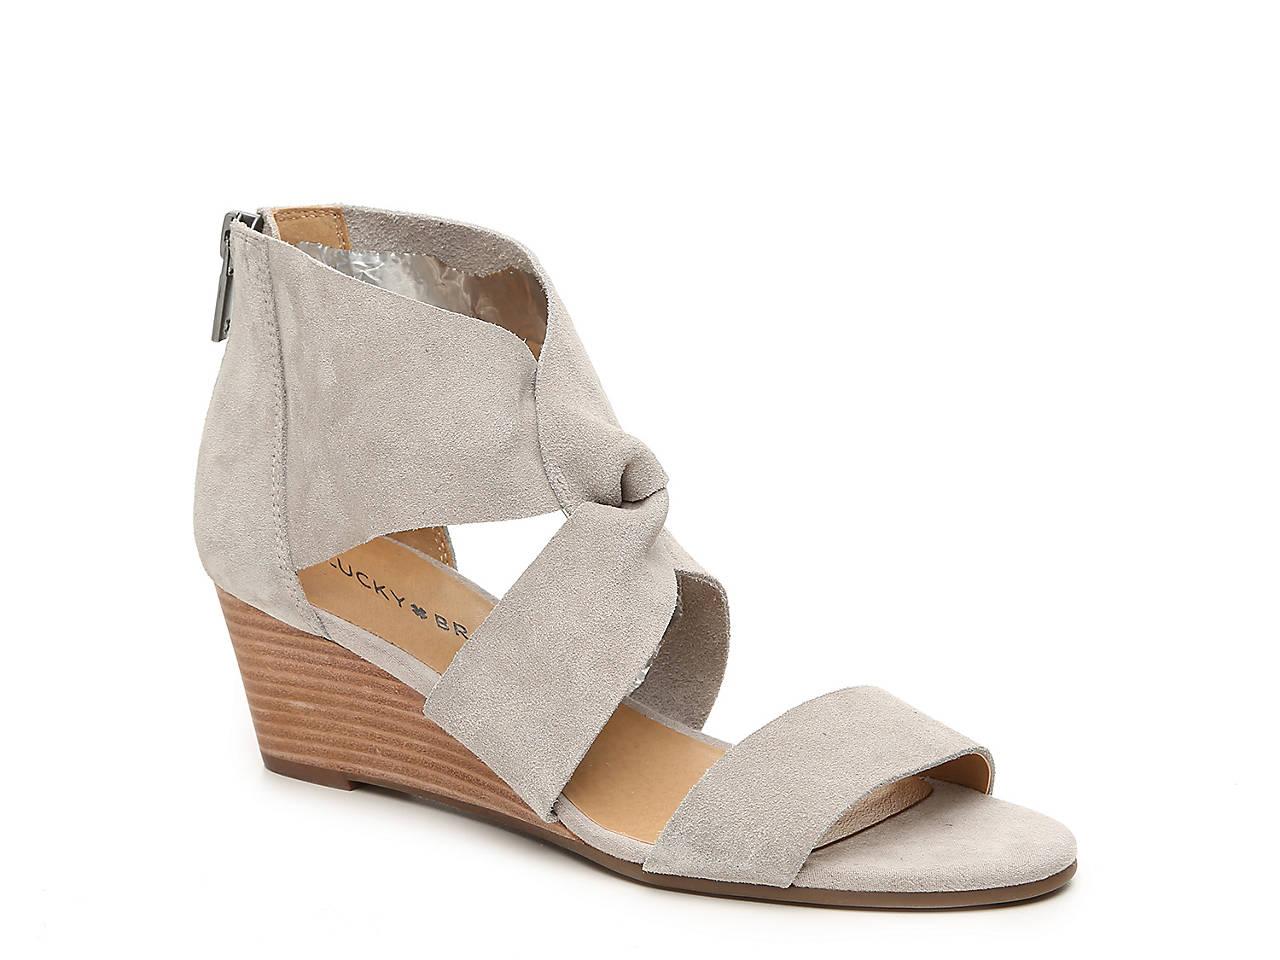 7fdf1fde3 Lucky Brand Jamain Wedge Sandal Women's Shoes | DSW